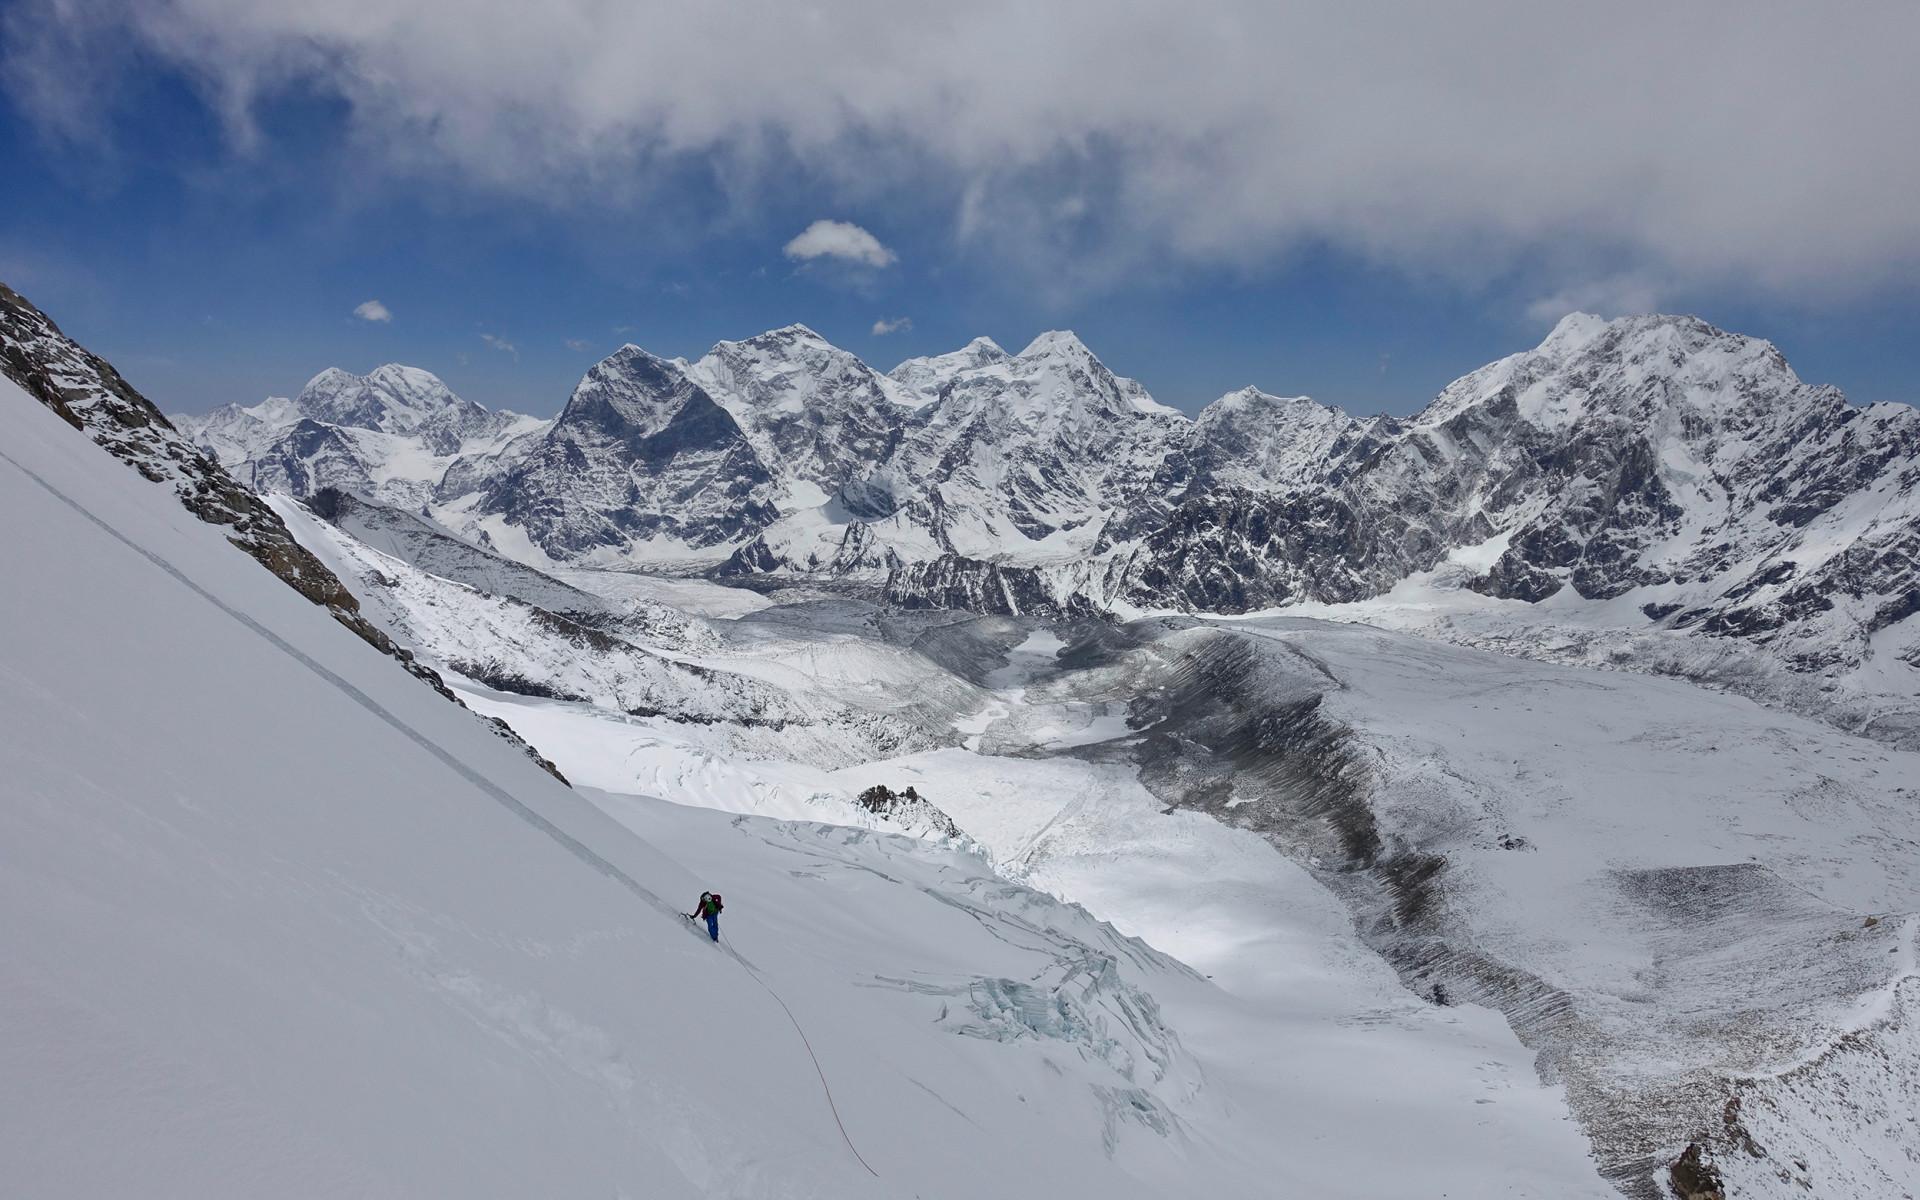 Start of the climb on Pungpa Ri.